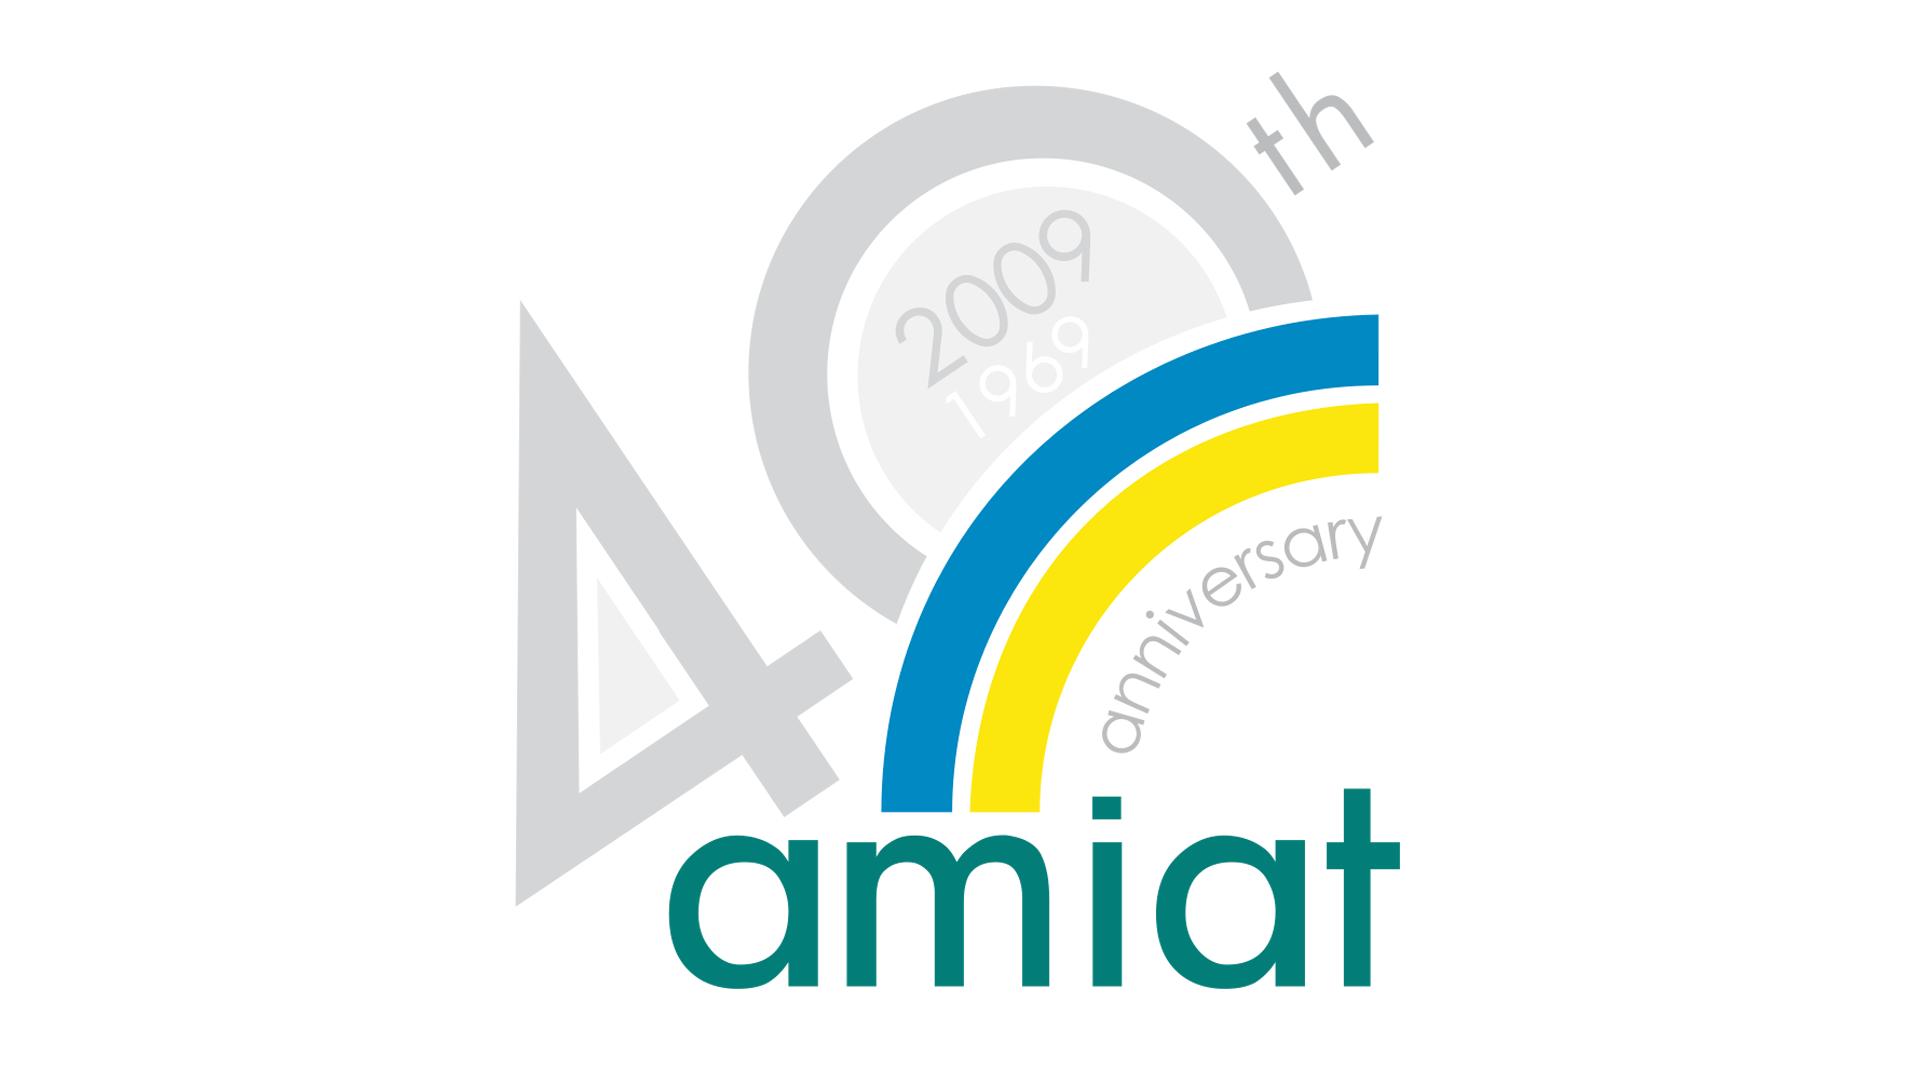 amiat_pic2